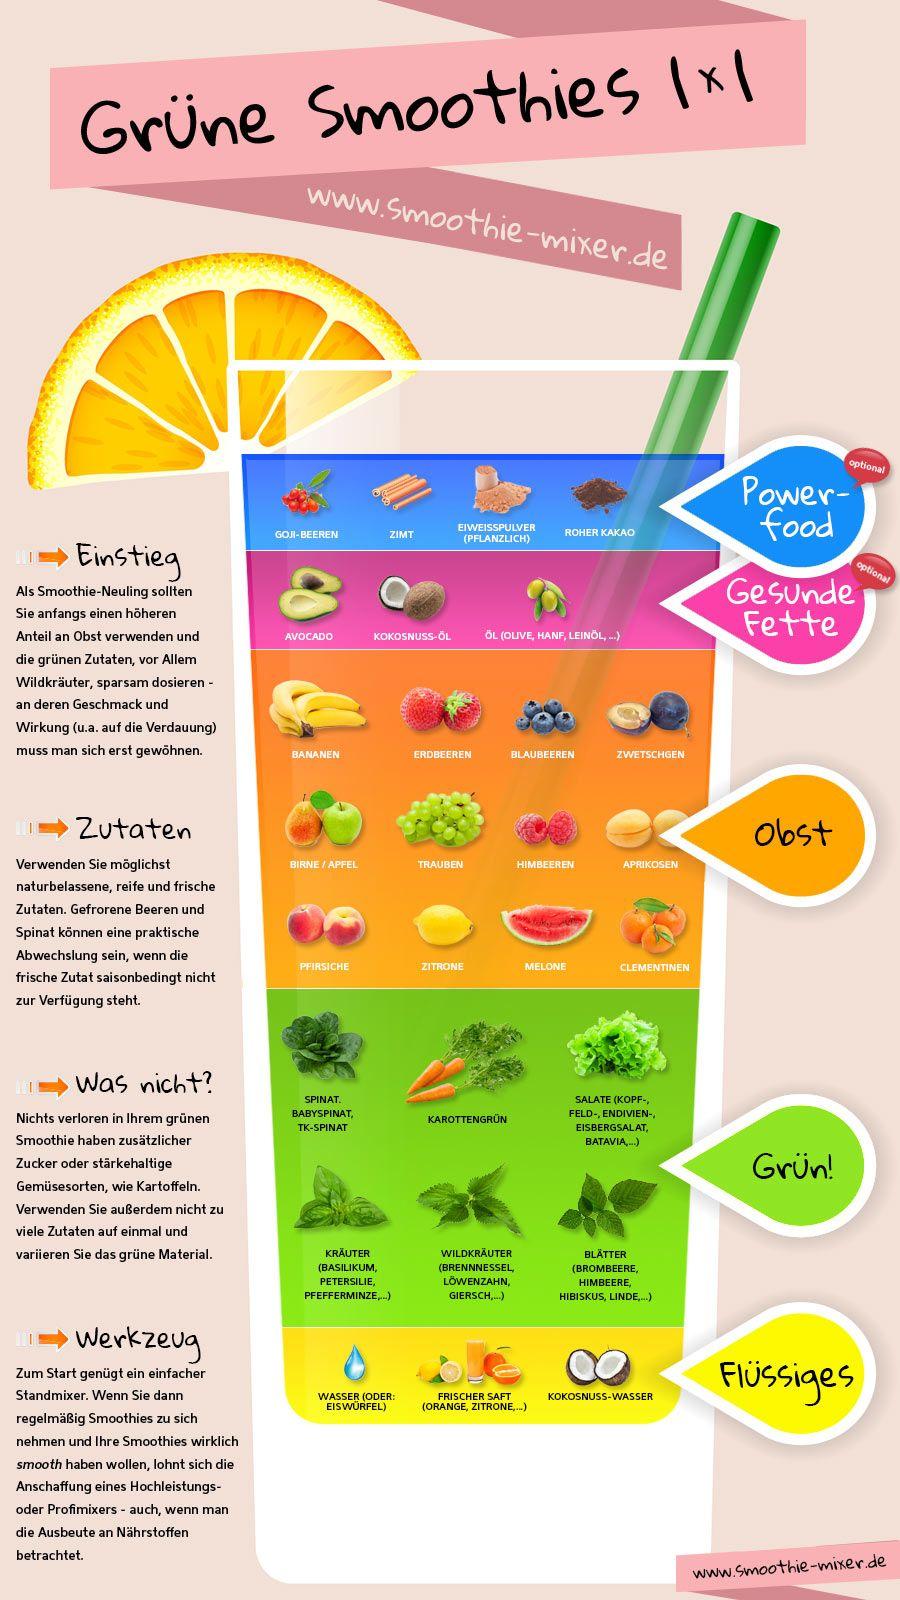 überblick grüne smoothies (Infografik)